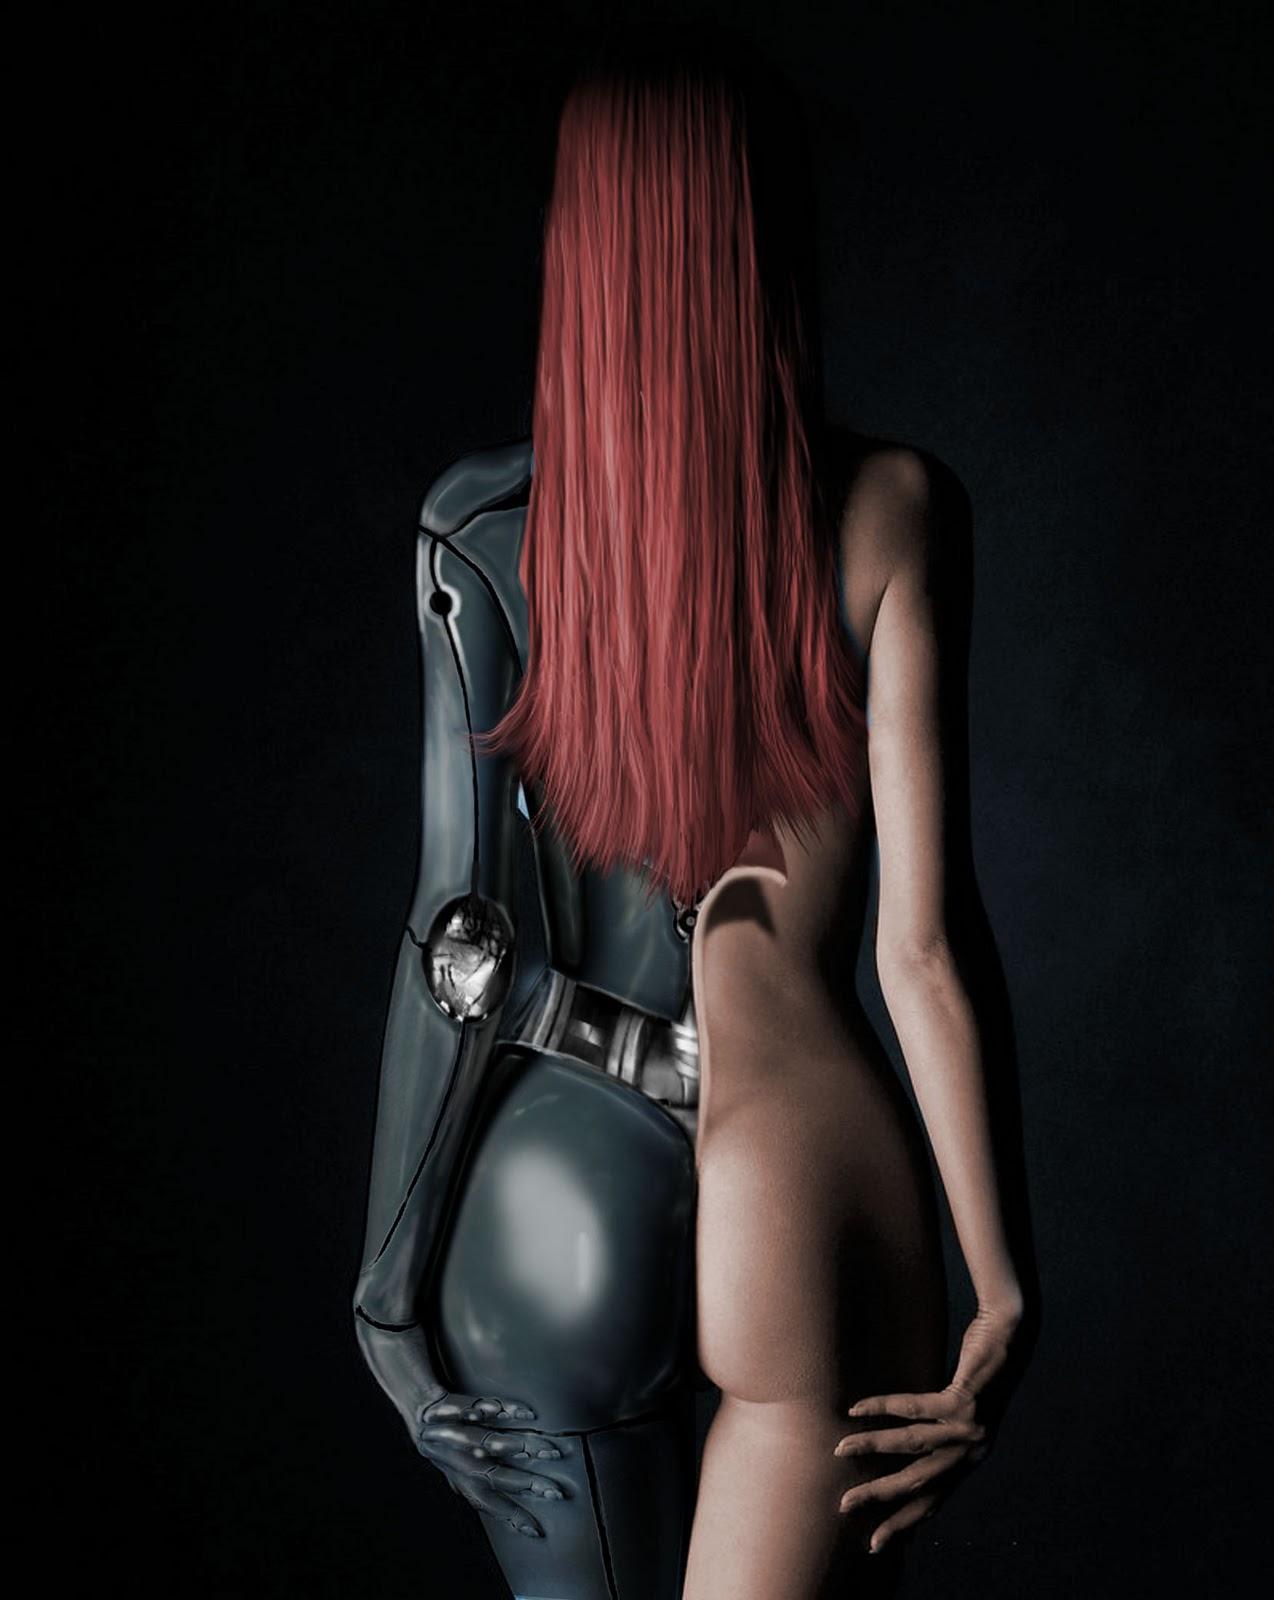 Э робот секс андроид 2 фотография